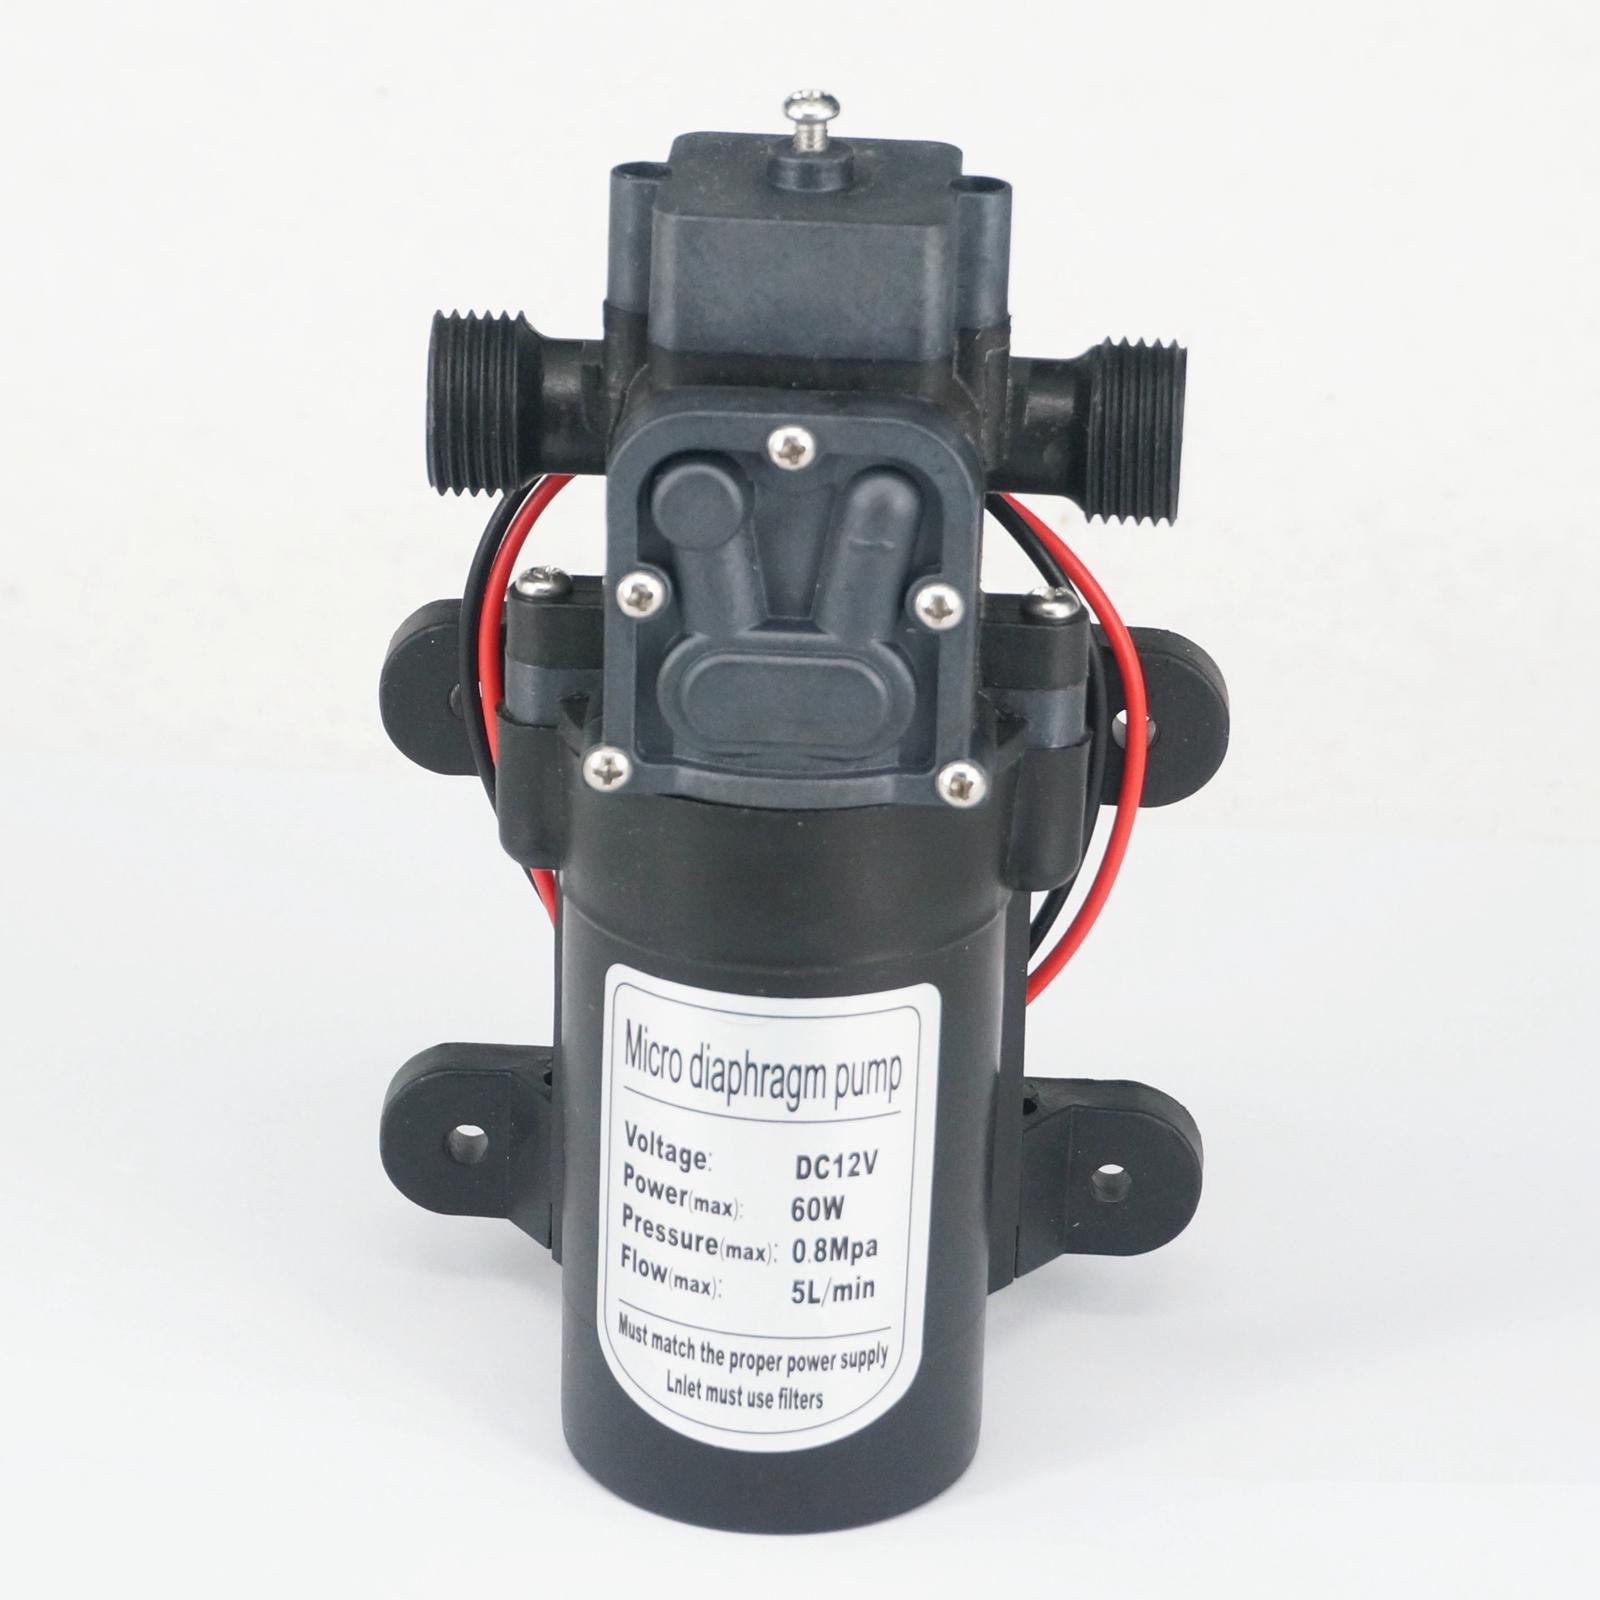 1/2 BSP Male DC 12V/24V 60W Electric Diaphragm Pump self-priming booster Backflow Control for Home garden Car washer 300L/H